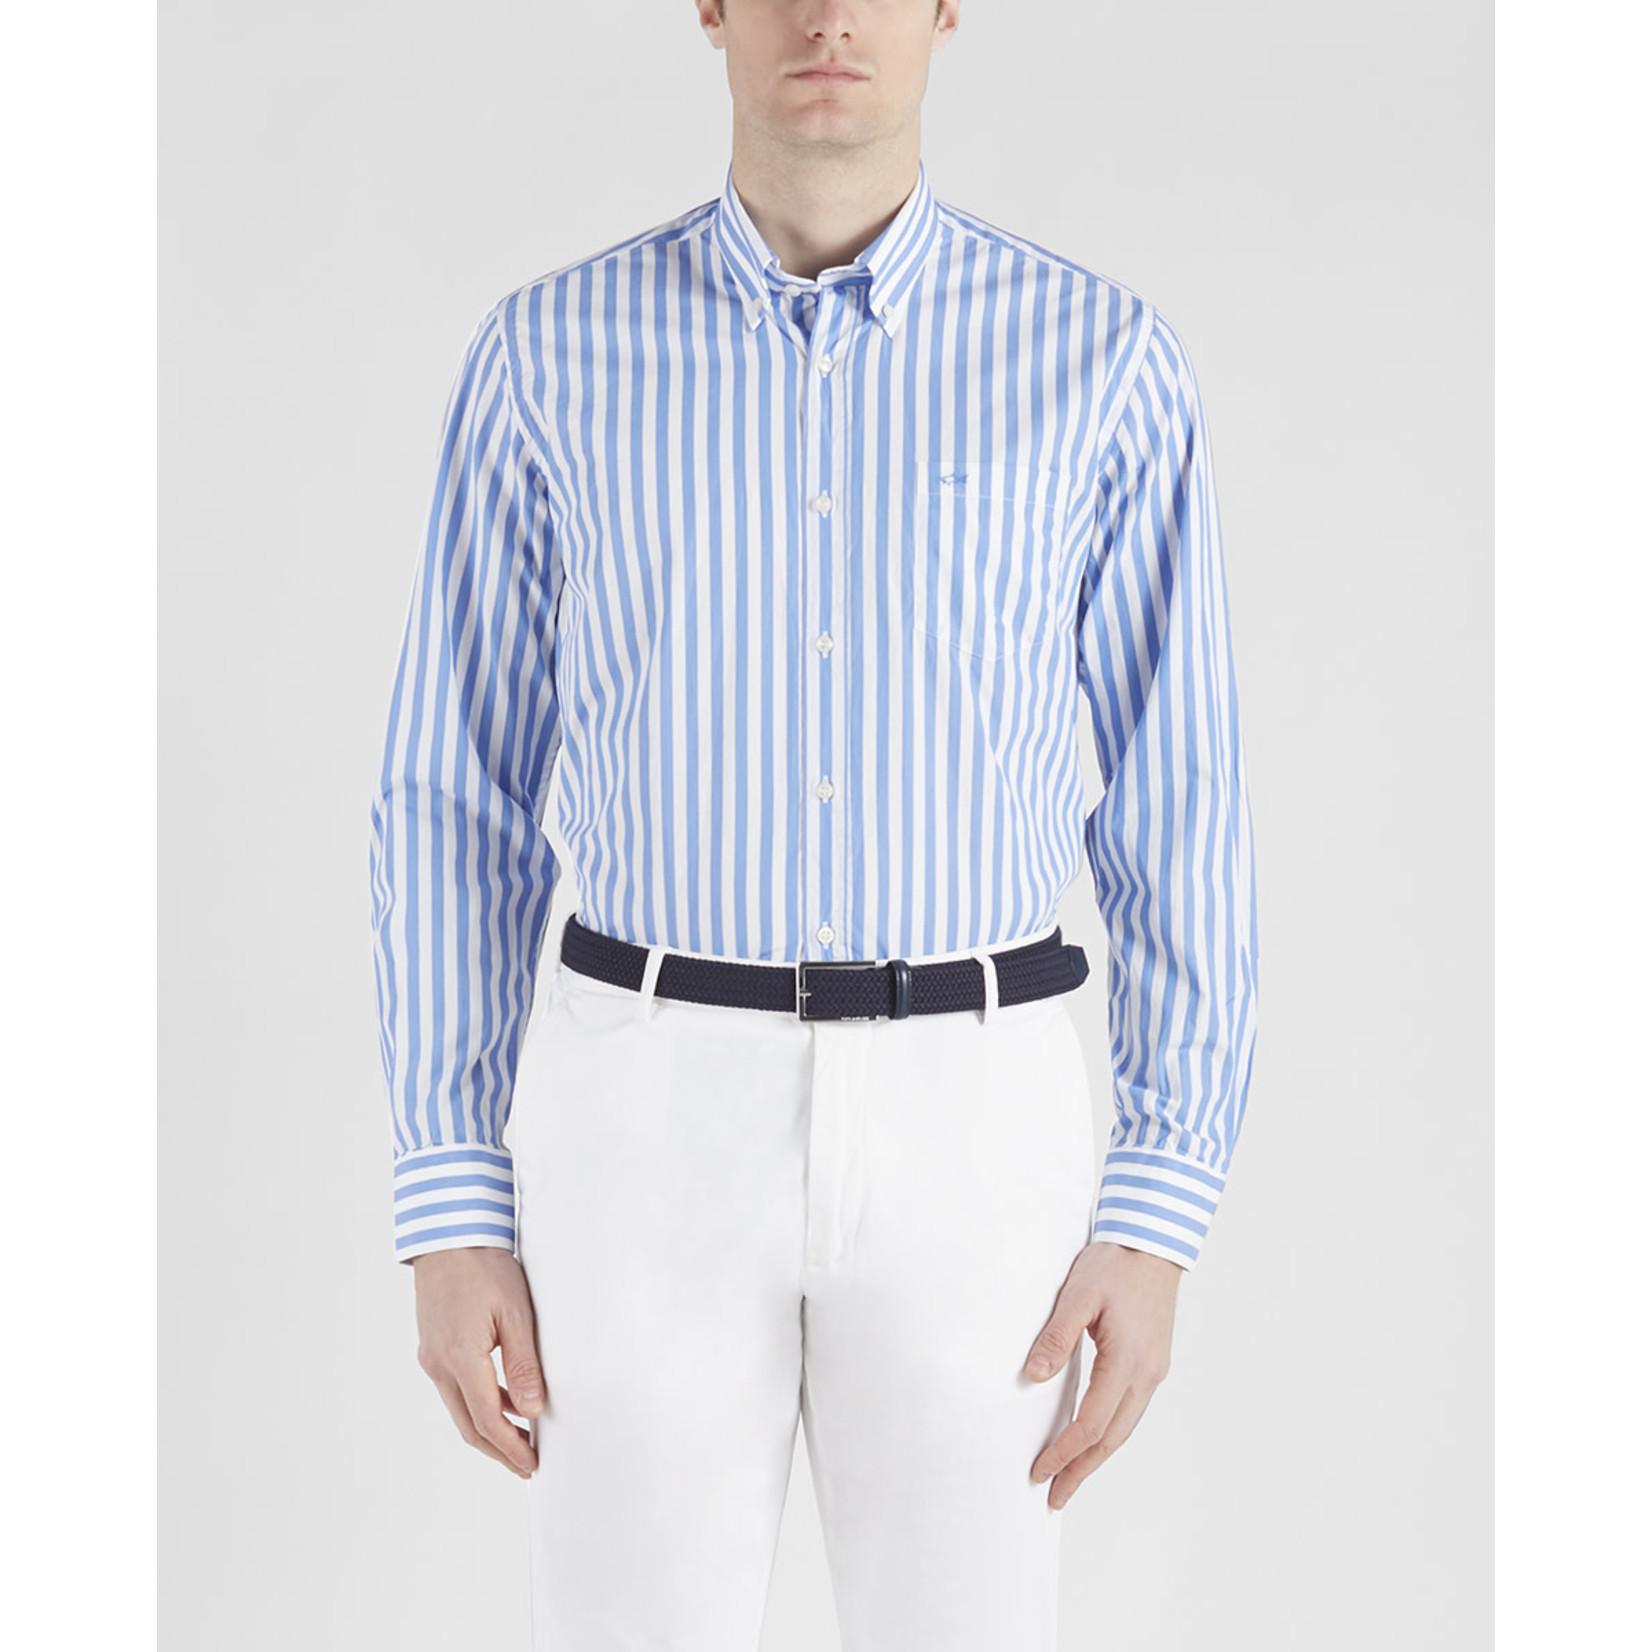 Paul & Shark overhemd lichtblauwe streep